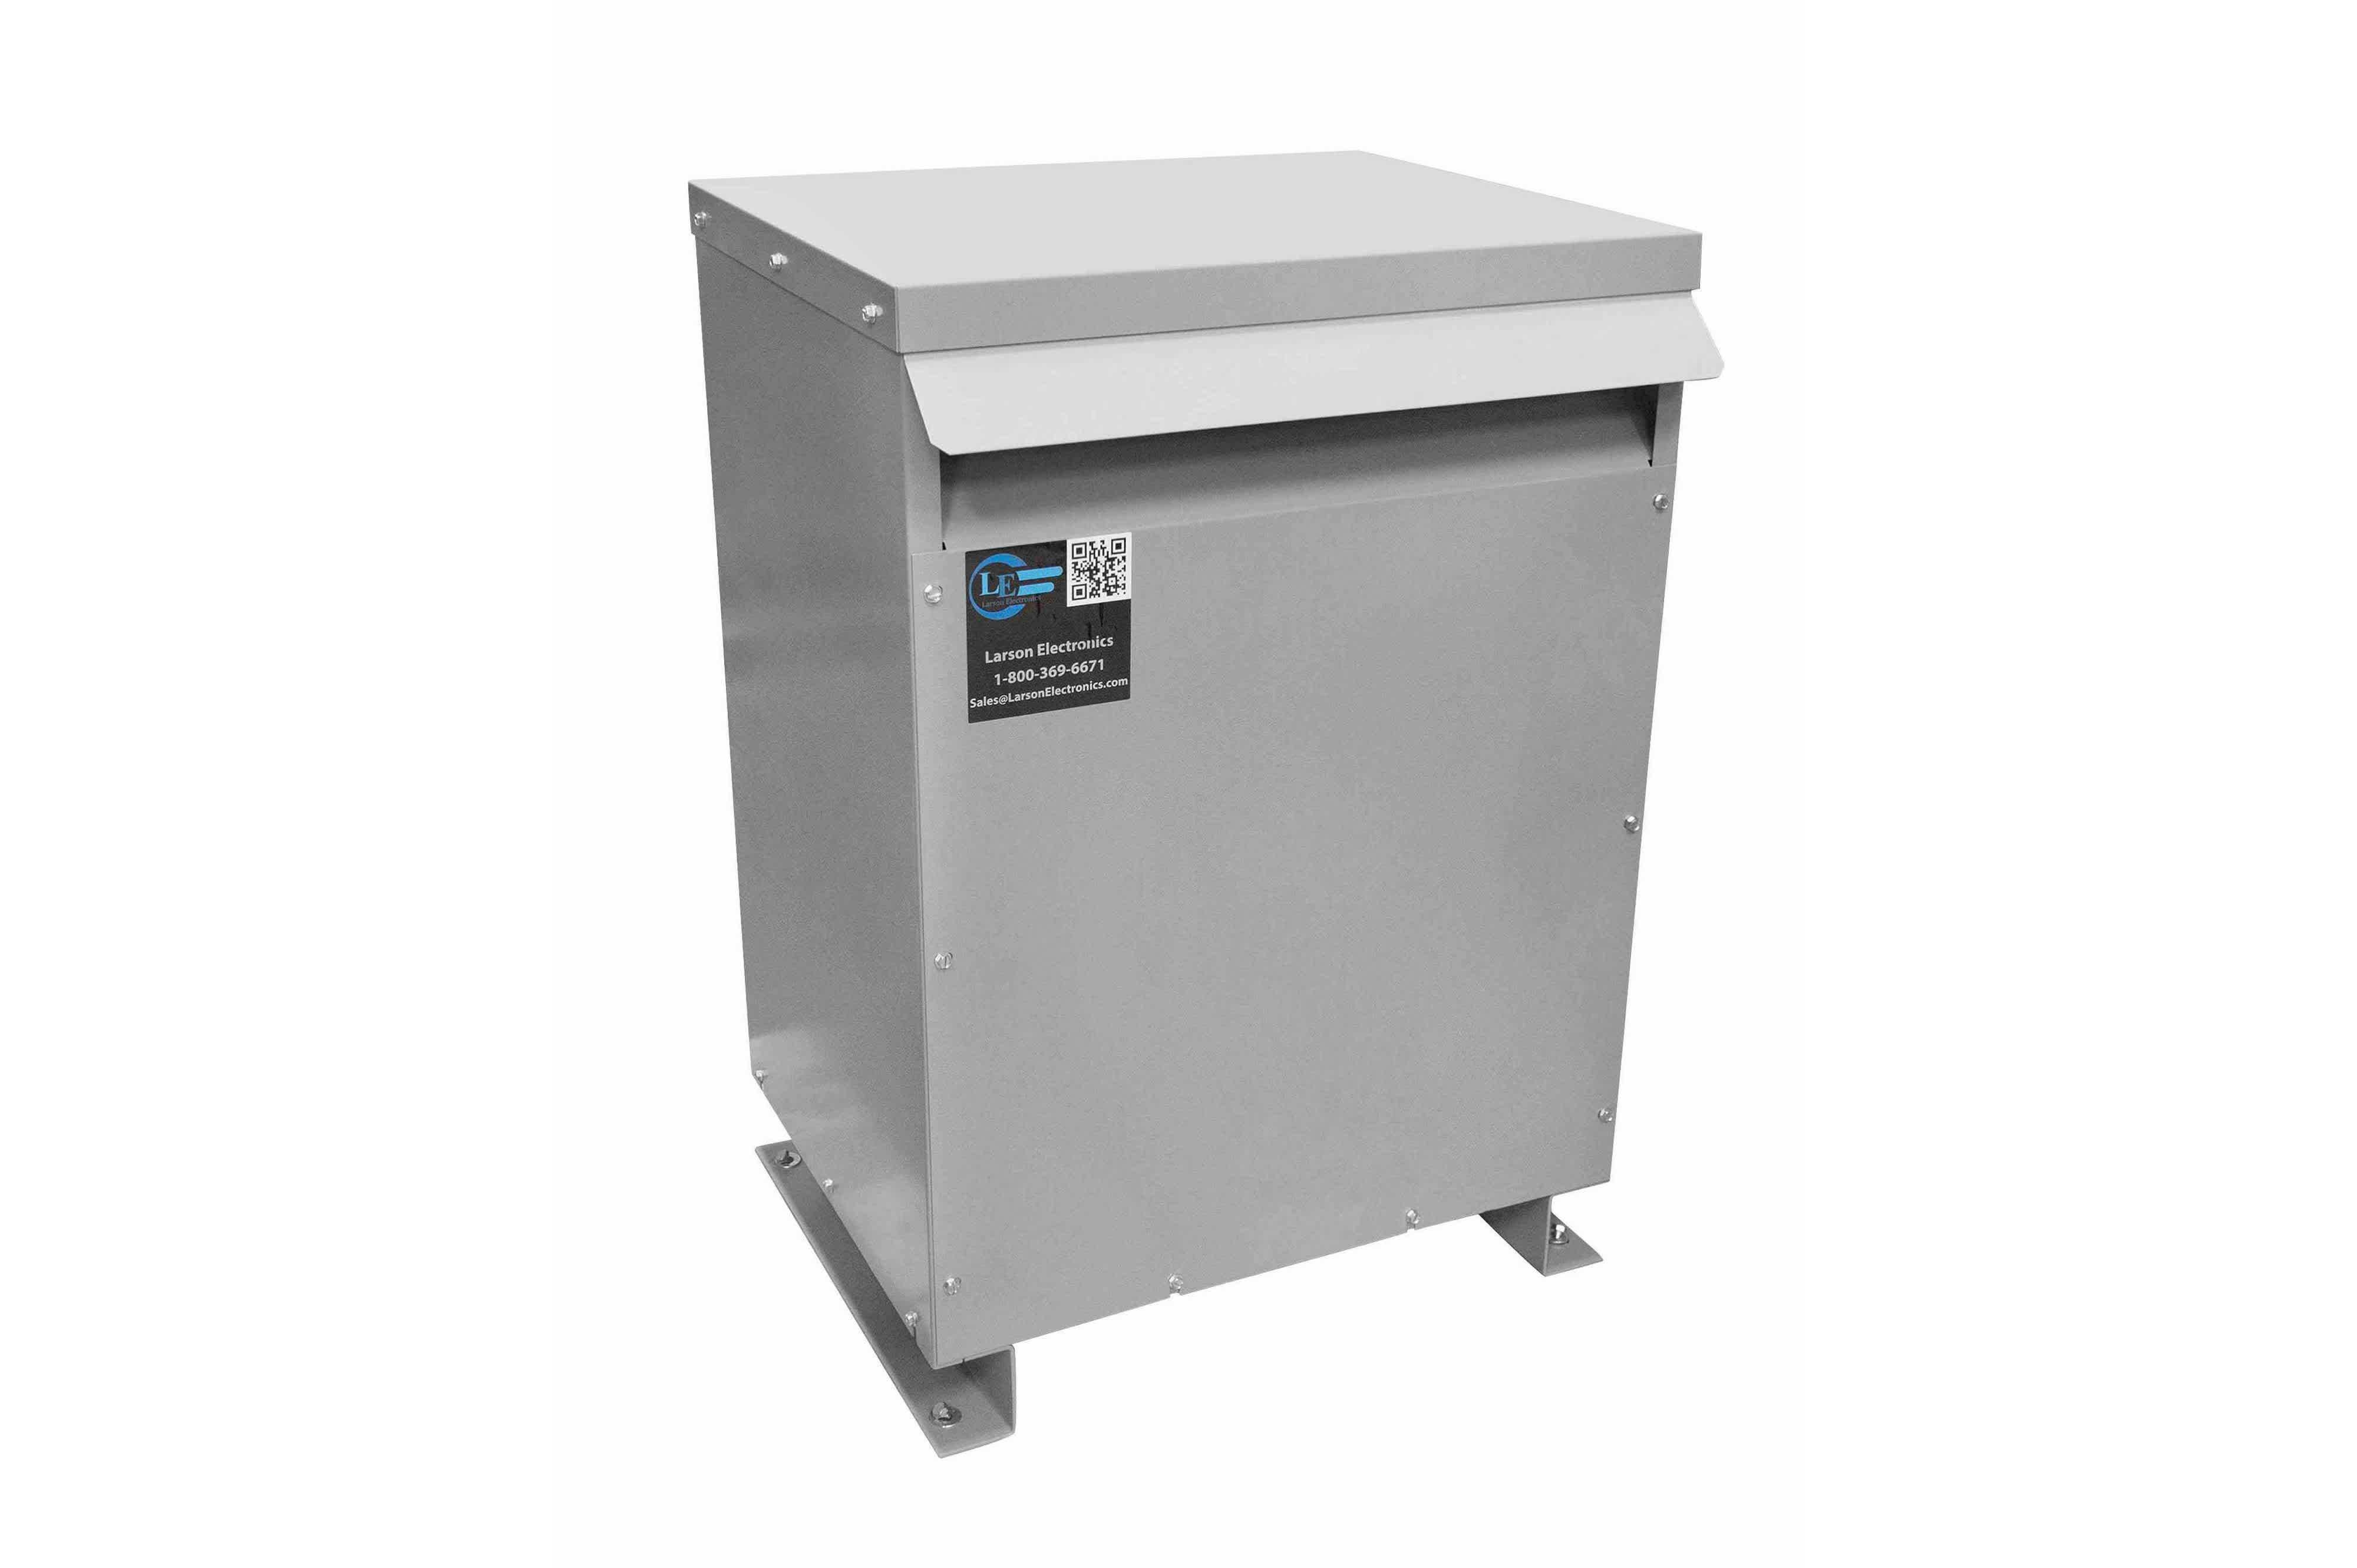 50 kVA 3PH Isolation Transformer, 208V Wye Primary, 480Y/277 Wye-N Secondary, N3R, Ventilated, 60 Hz